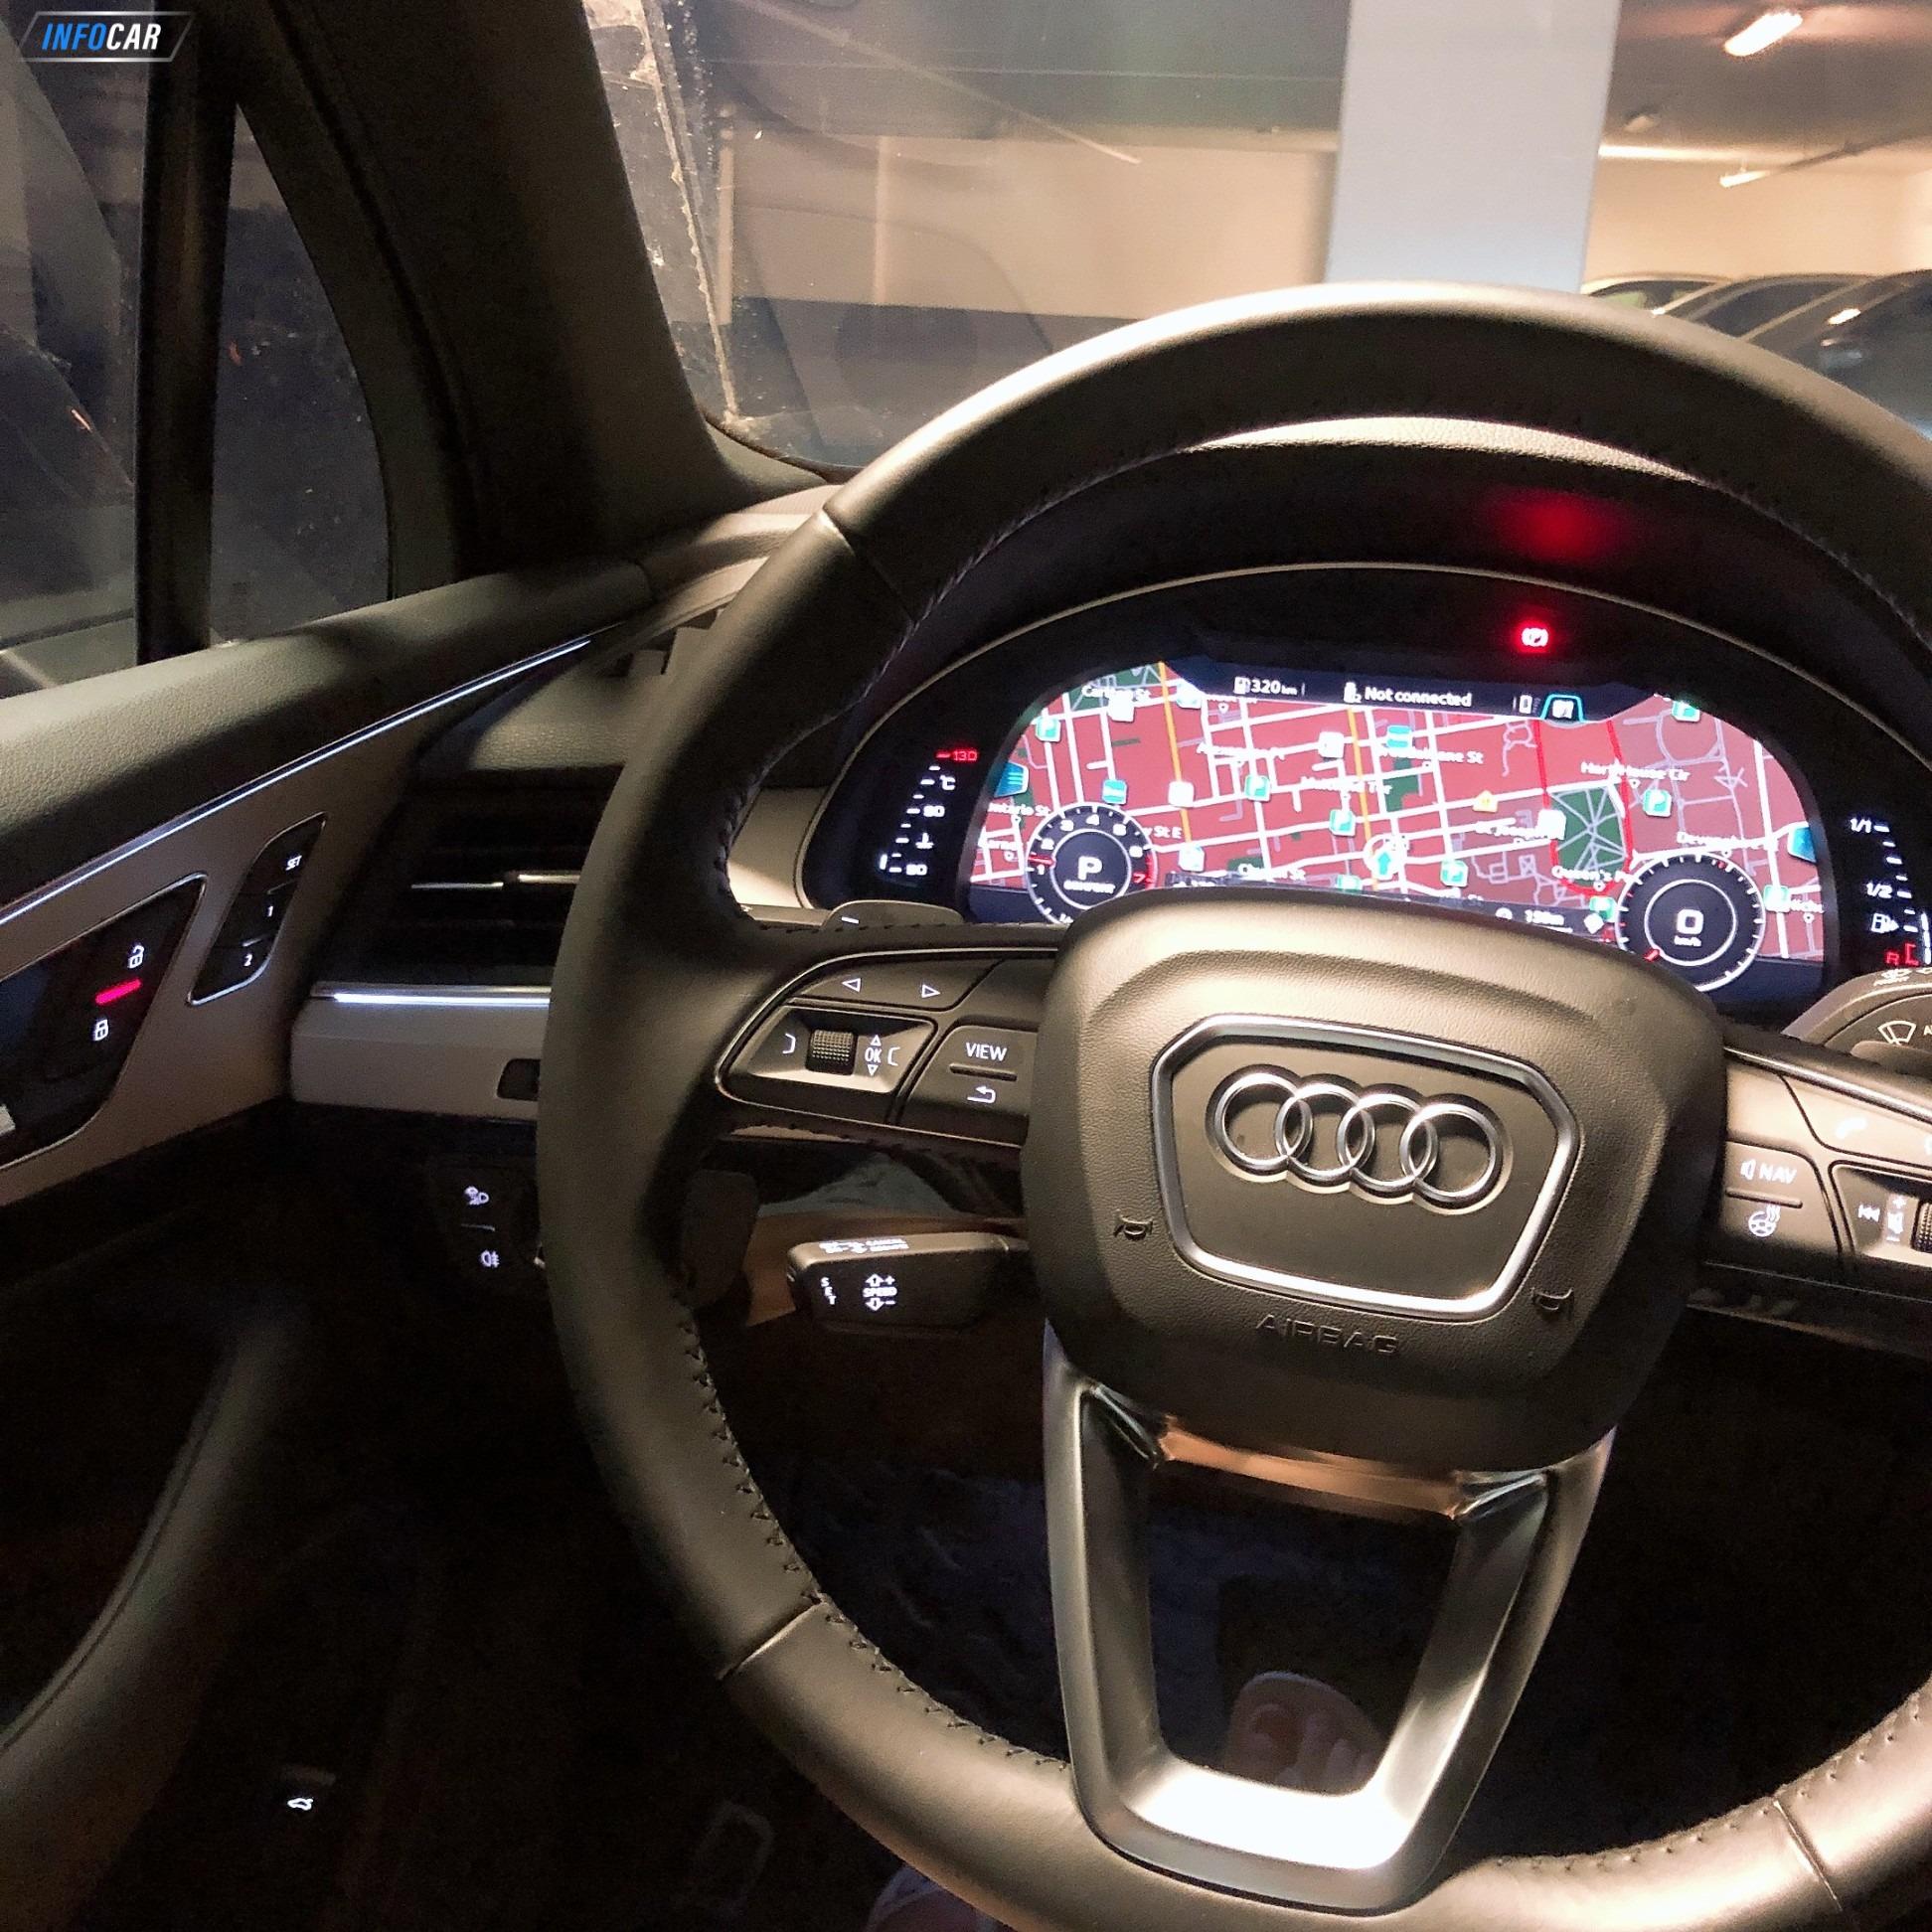 2018 Audi Q7  - INFOCAR - Toronto's Most Comprehensive New and Used Auto Trading Platform